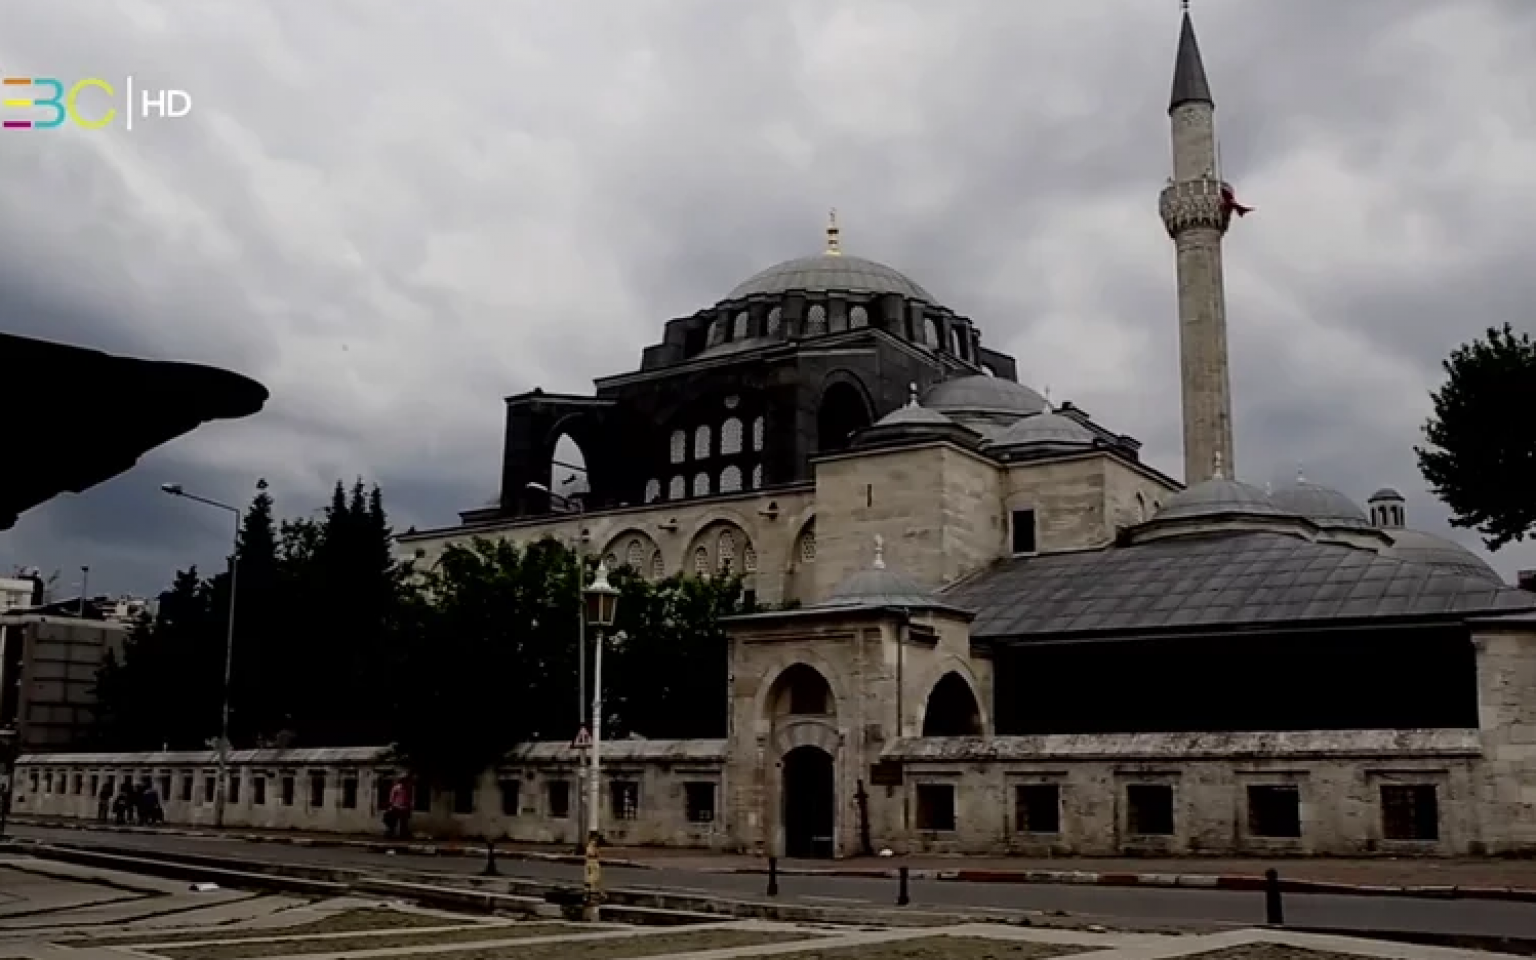 Kılıç Ali Pasha Complex